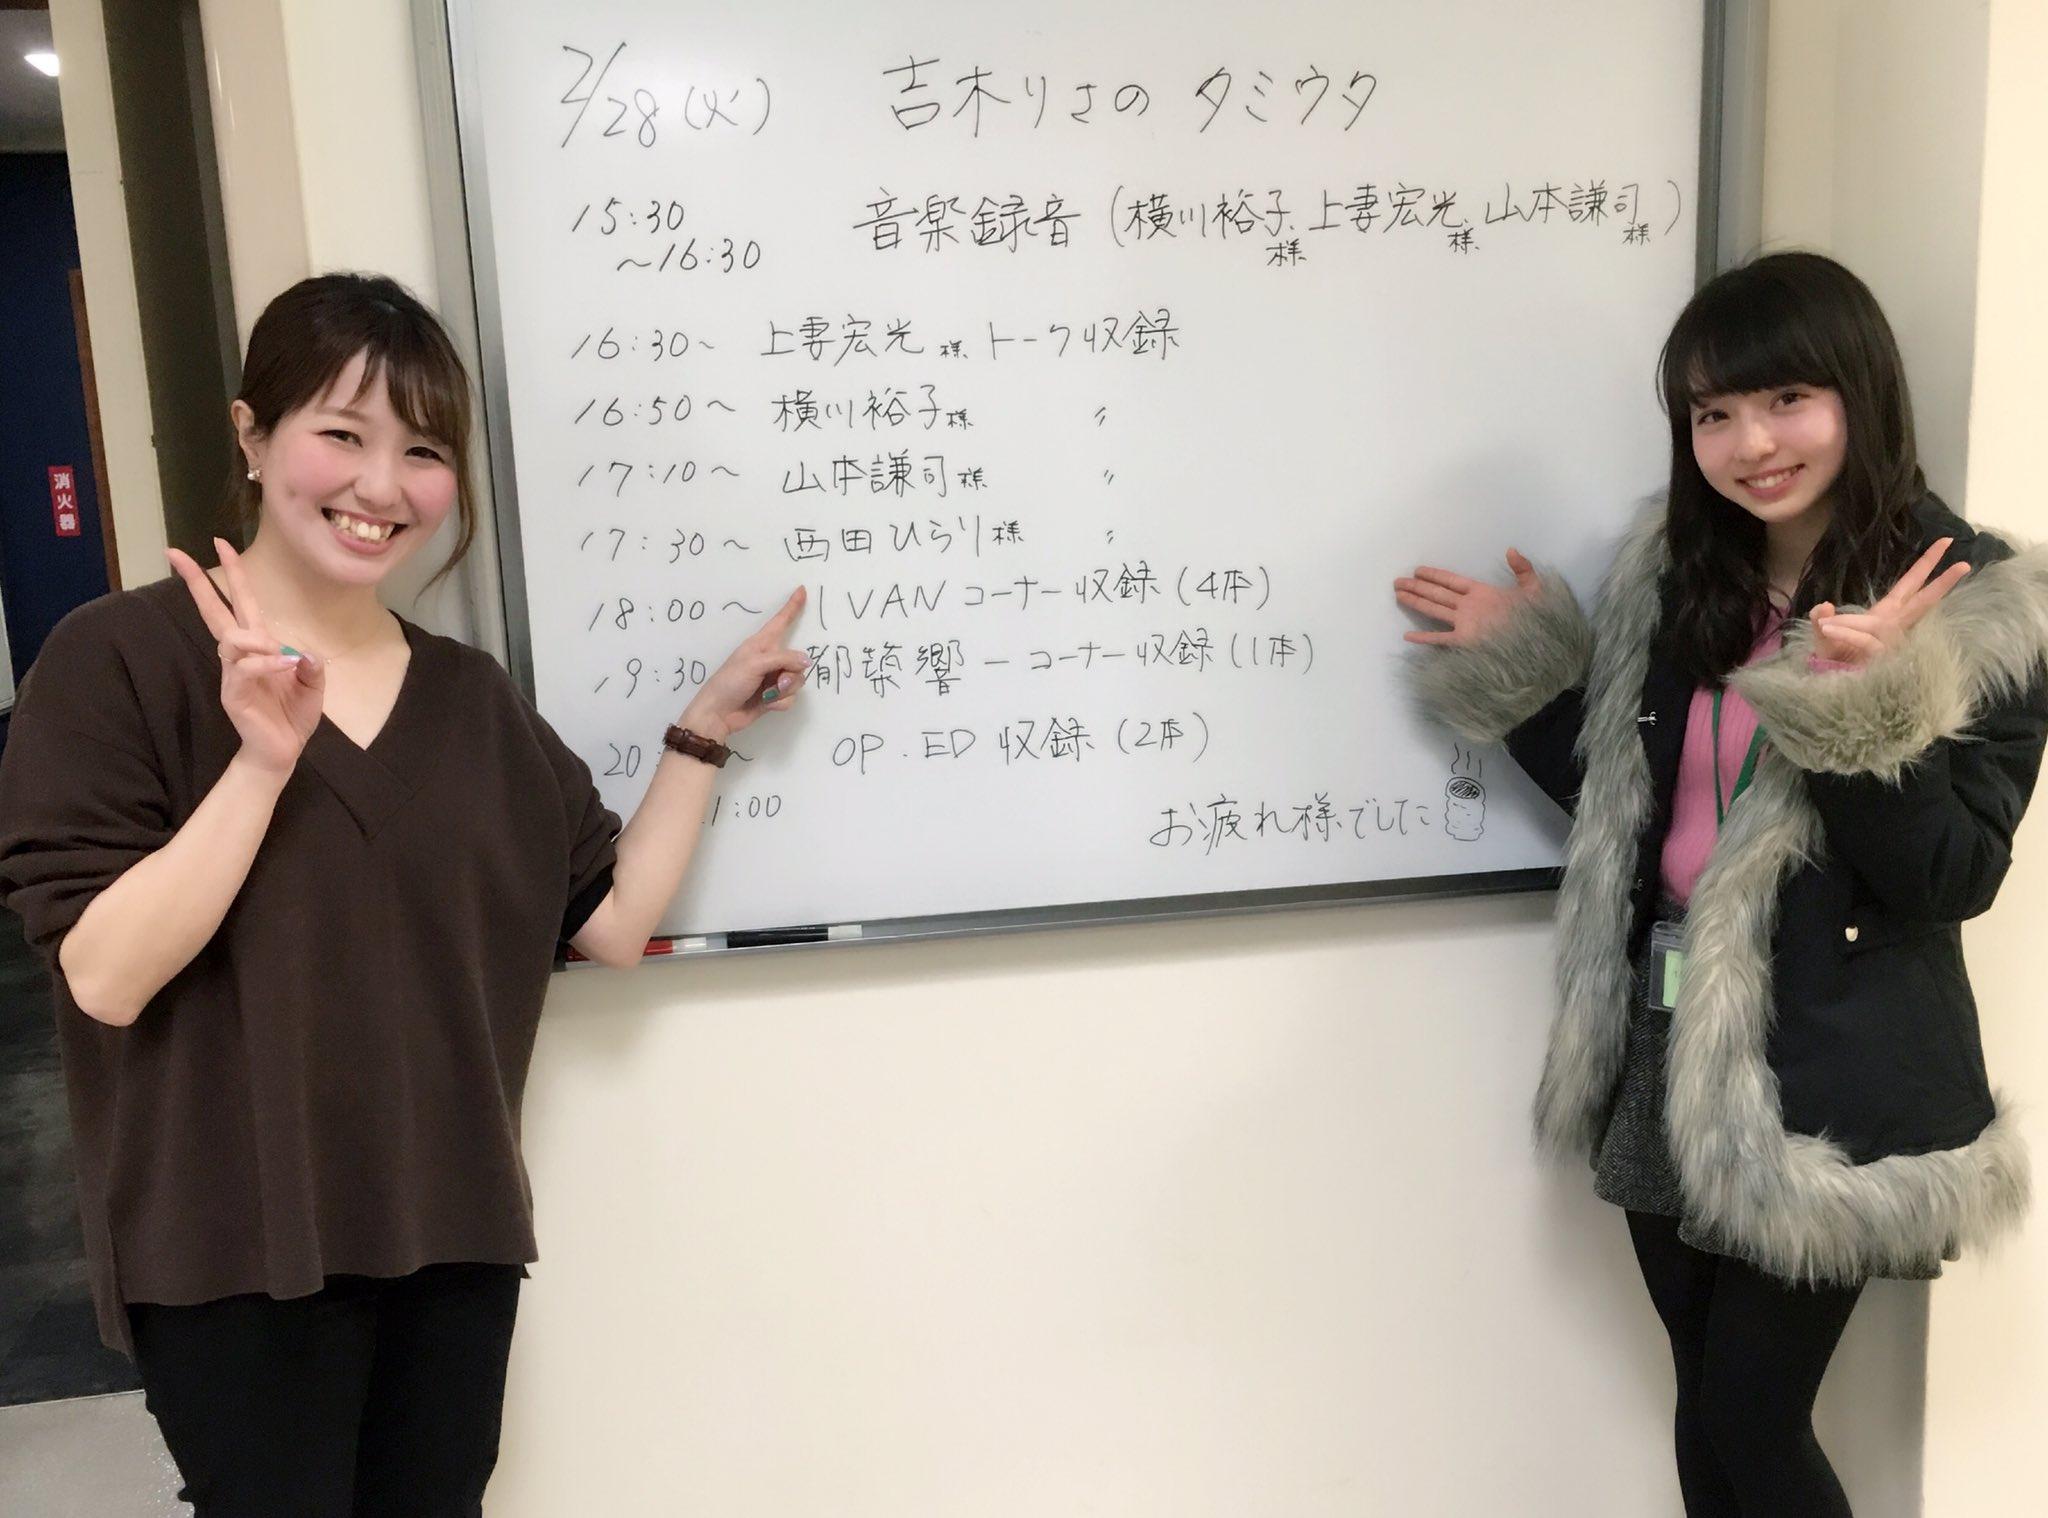 A-Pop Idols 429655   Nishida Hirari : Gem   西田ひらり : gem